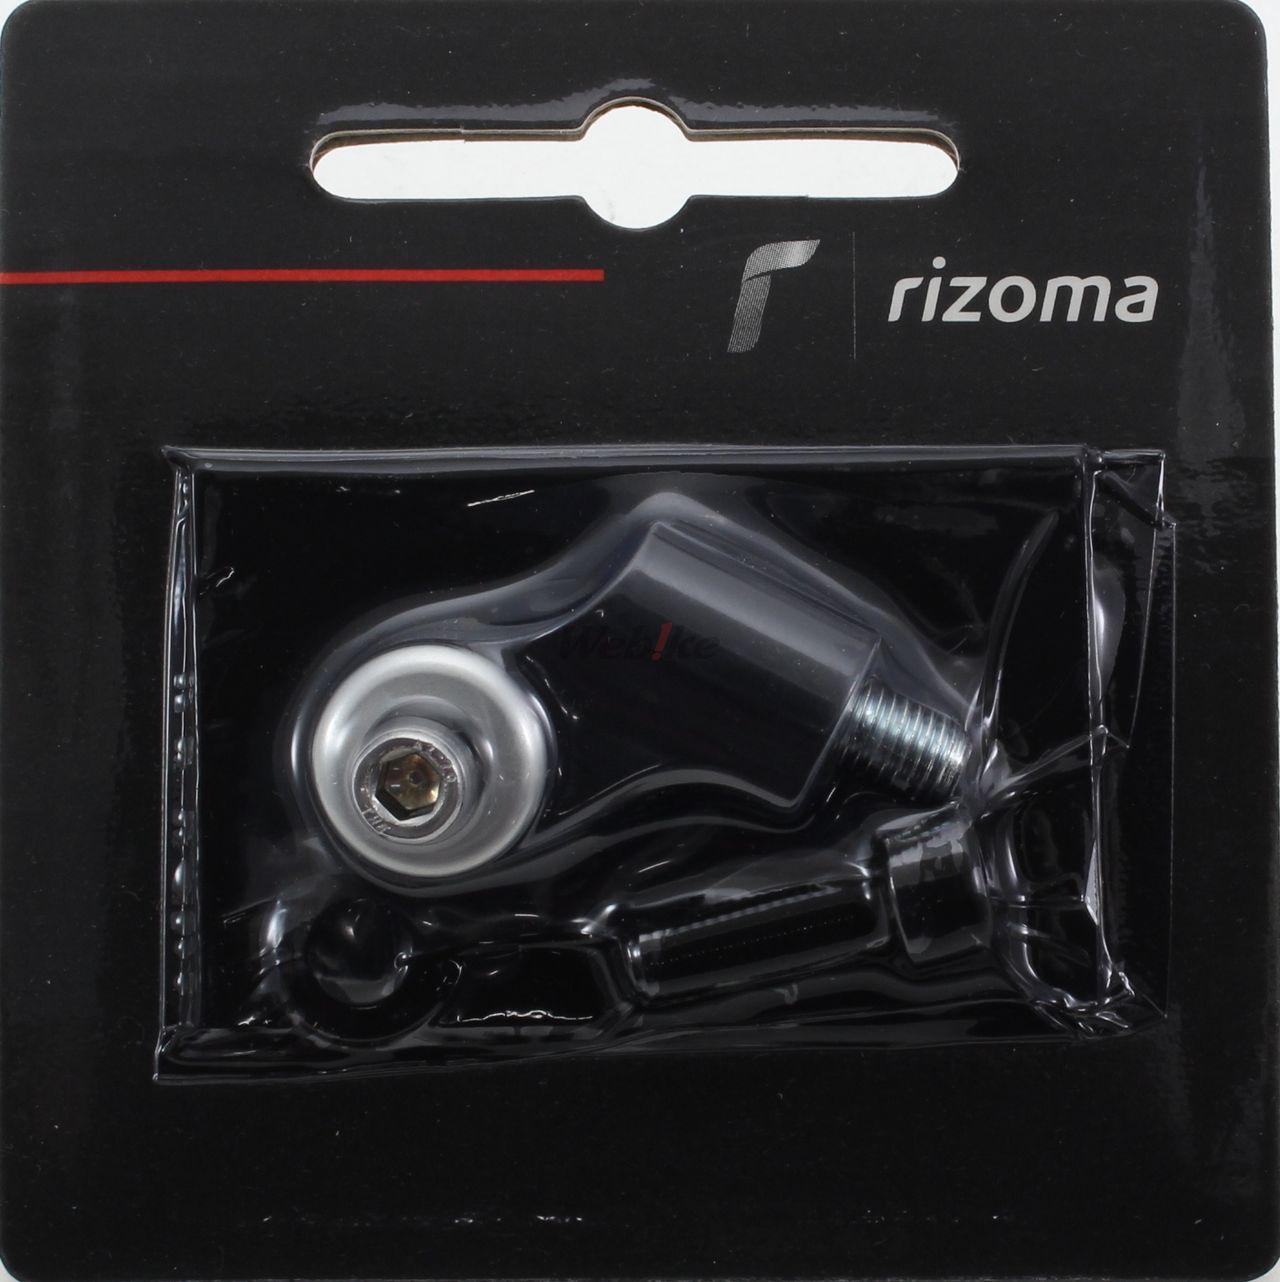 【RIZOMA】後視鏡用轉接座 - 「Webike-摩托百貨」